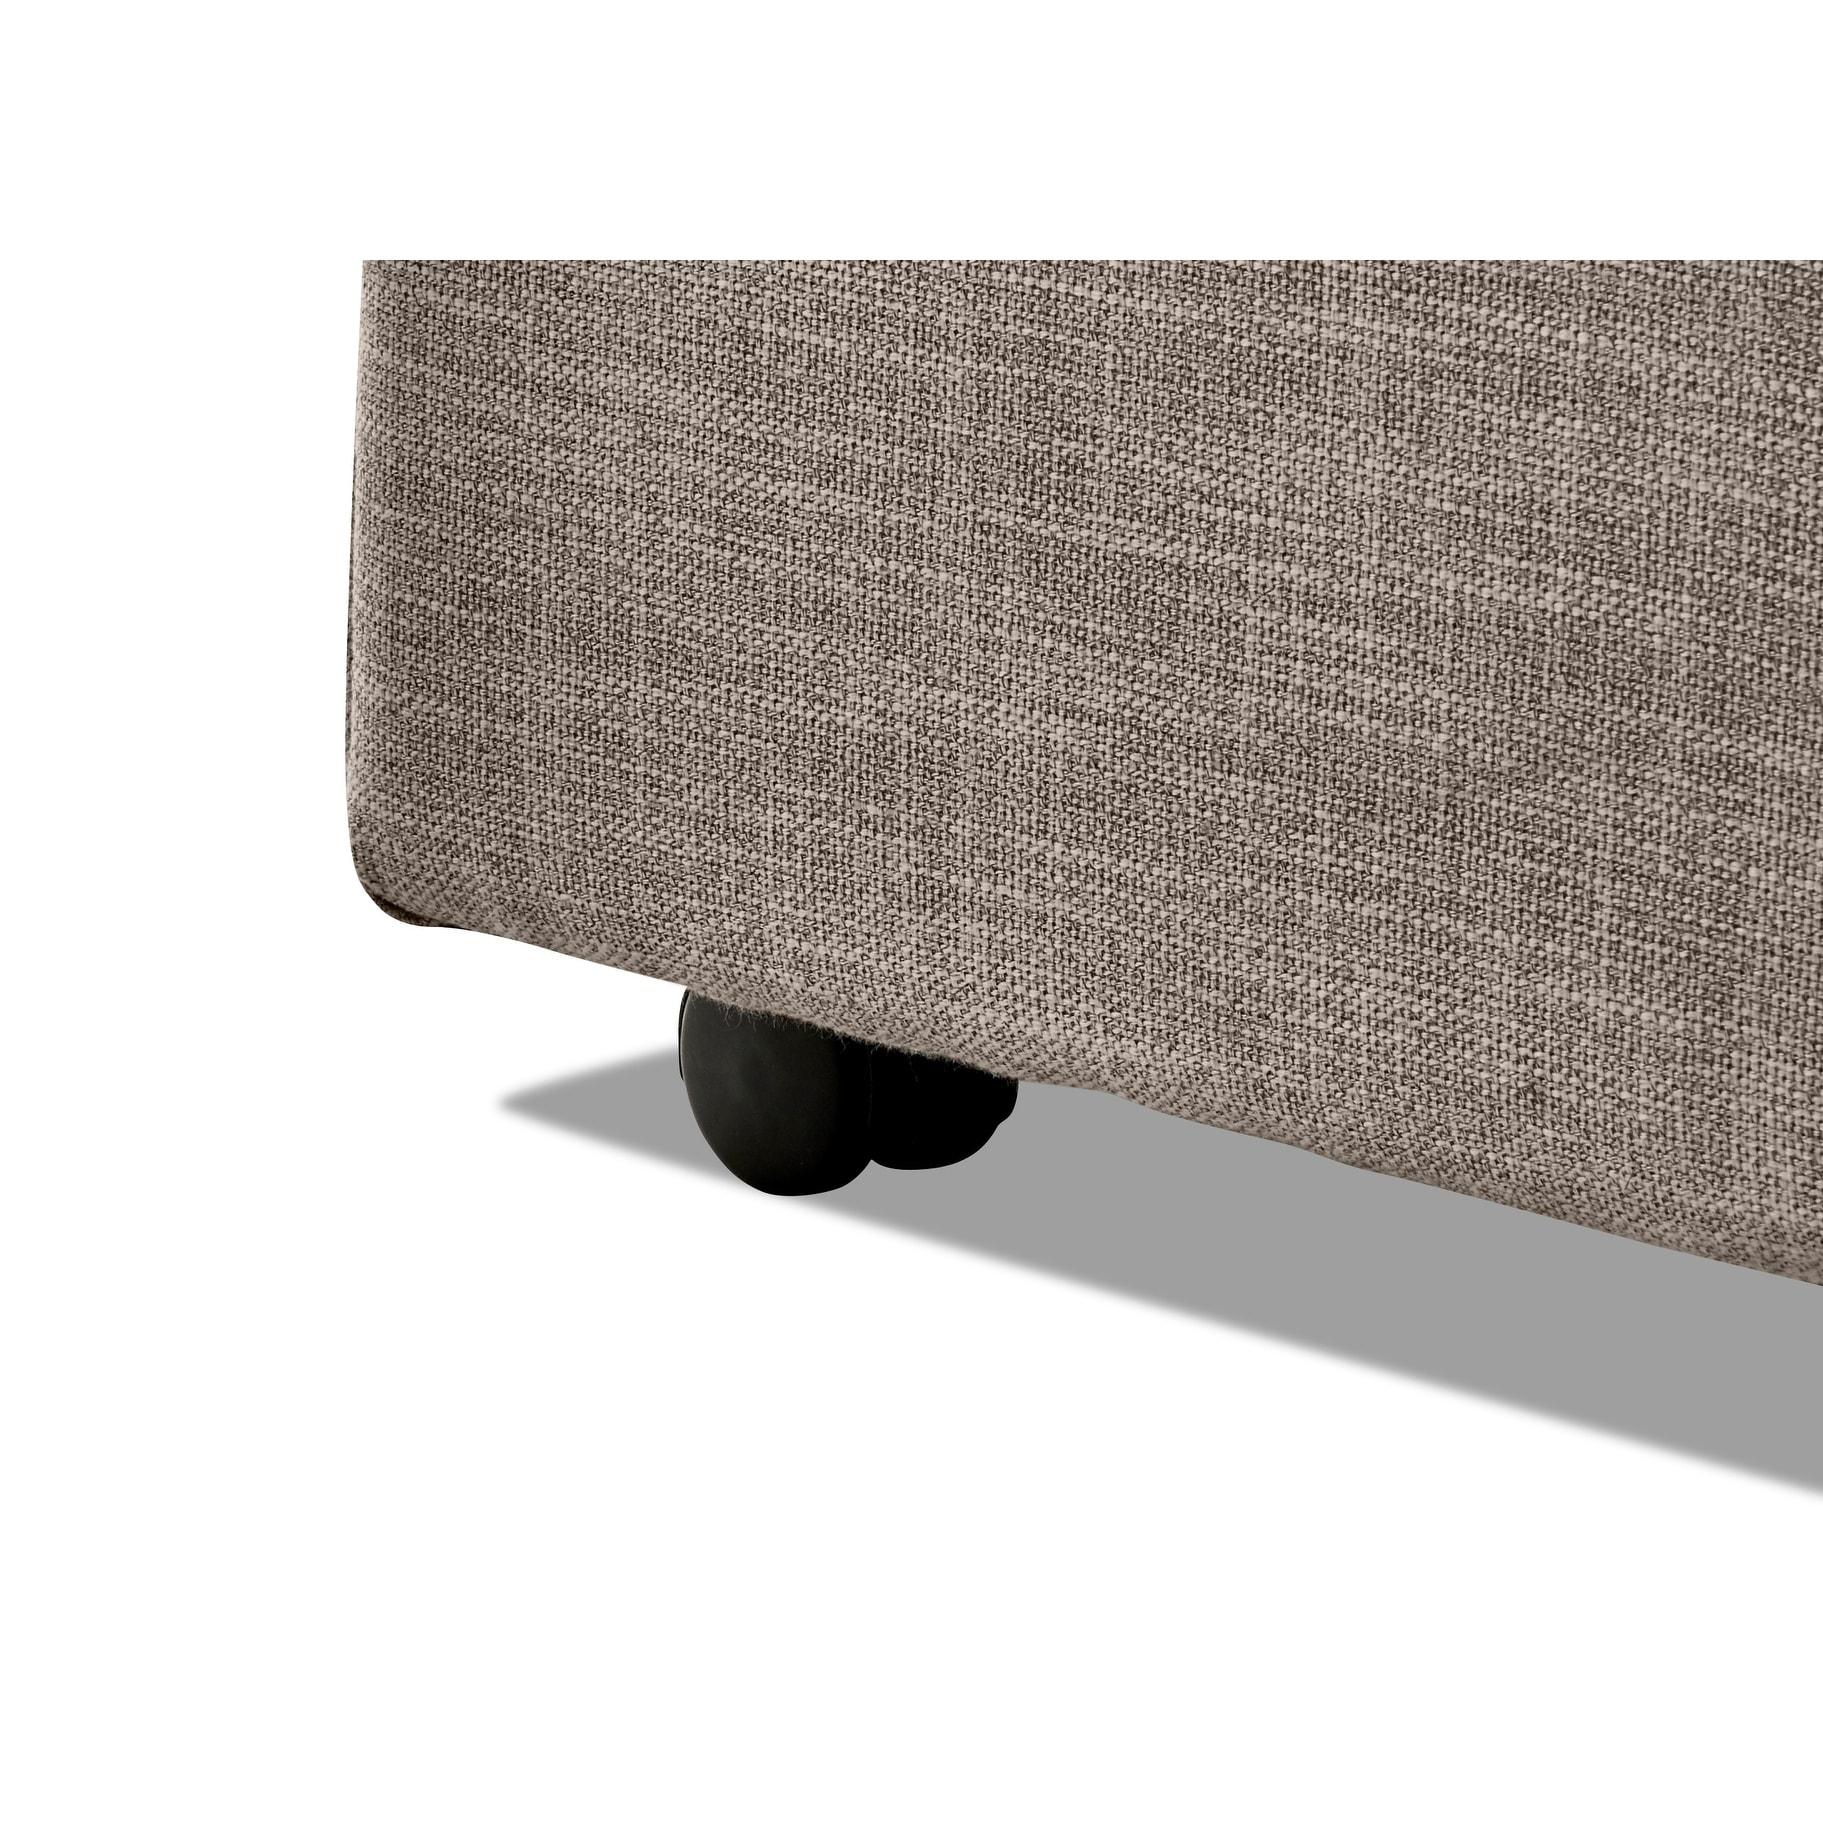 Excellent Jolene Rectangular Storage Ottoman By Avenue 405 Inzonedesignstudio Interior Chair Design Inzonedesignstudiocom